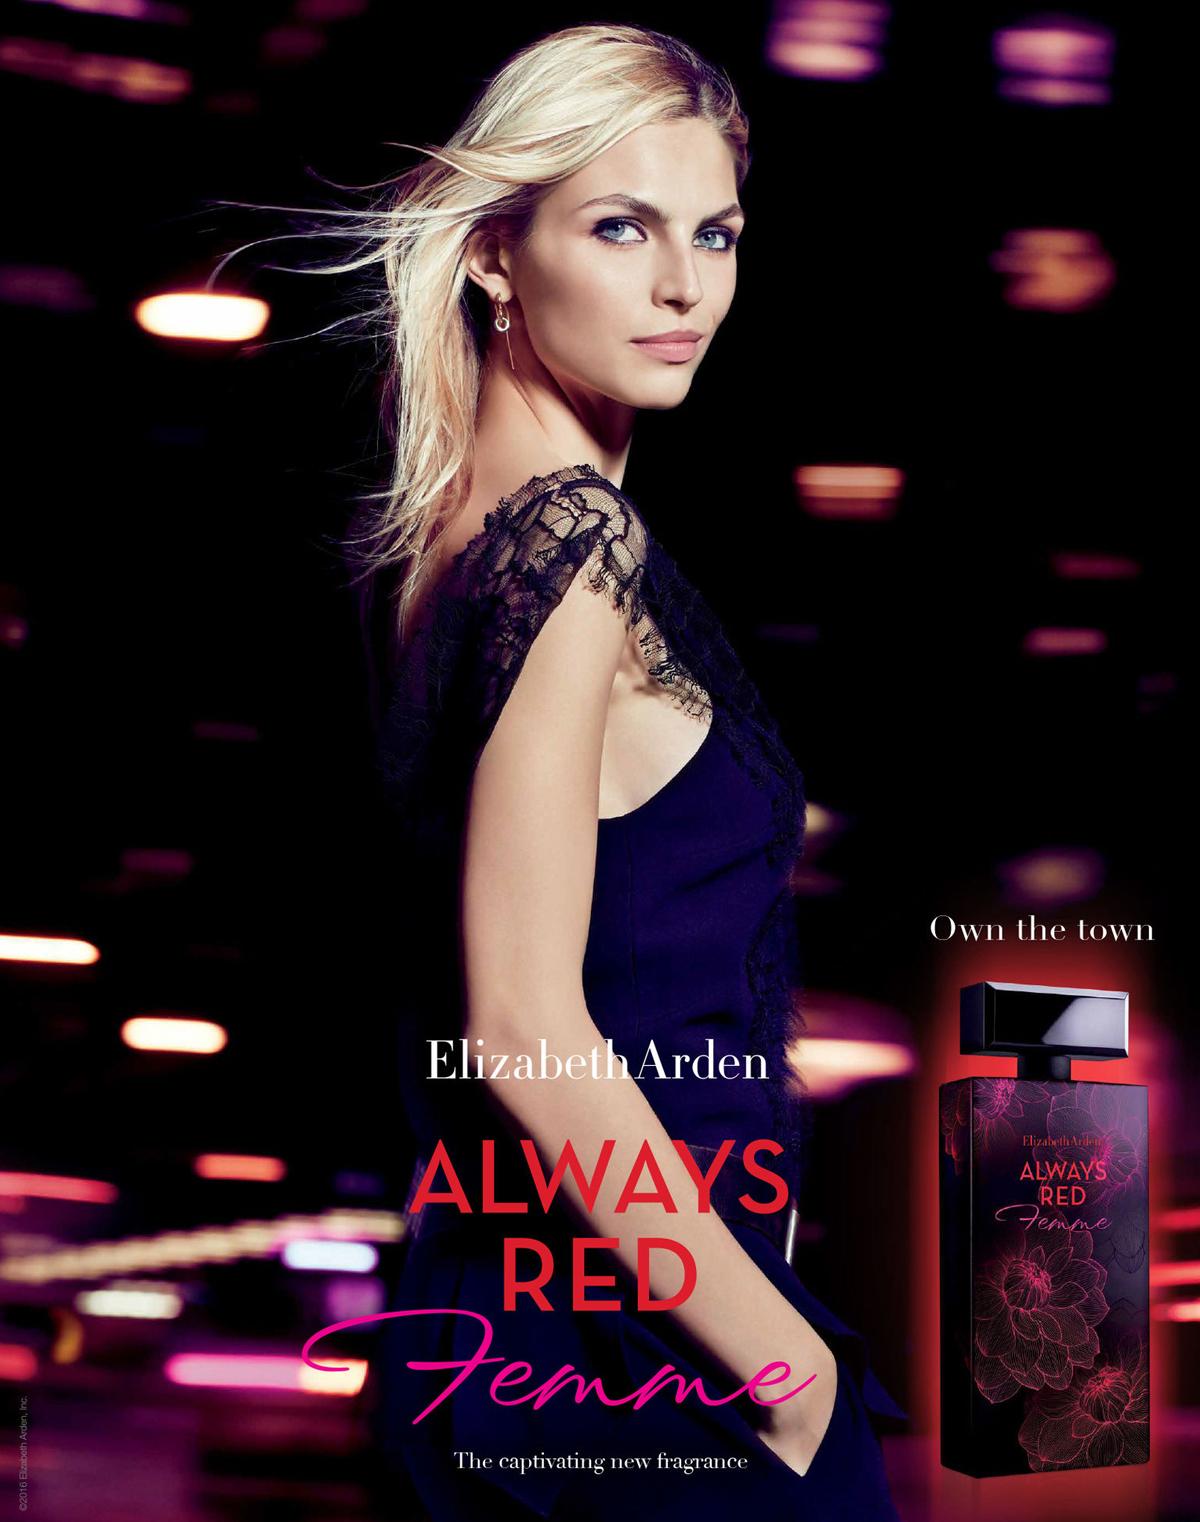 Always Red Femme Elizabeth Arden Perfume A New Fragrance For Women